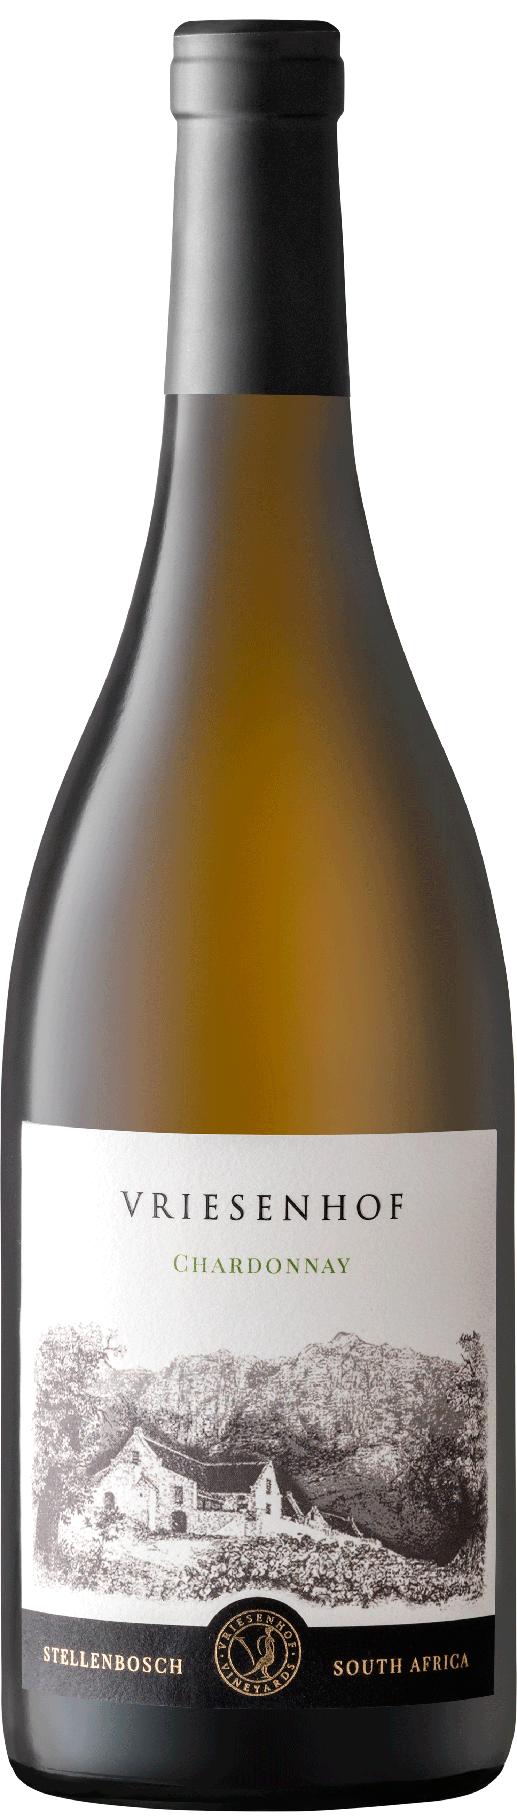 Vriesenhof Wooded Chardonnay 2015